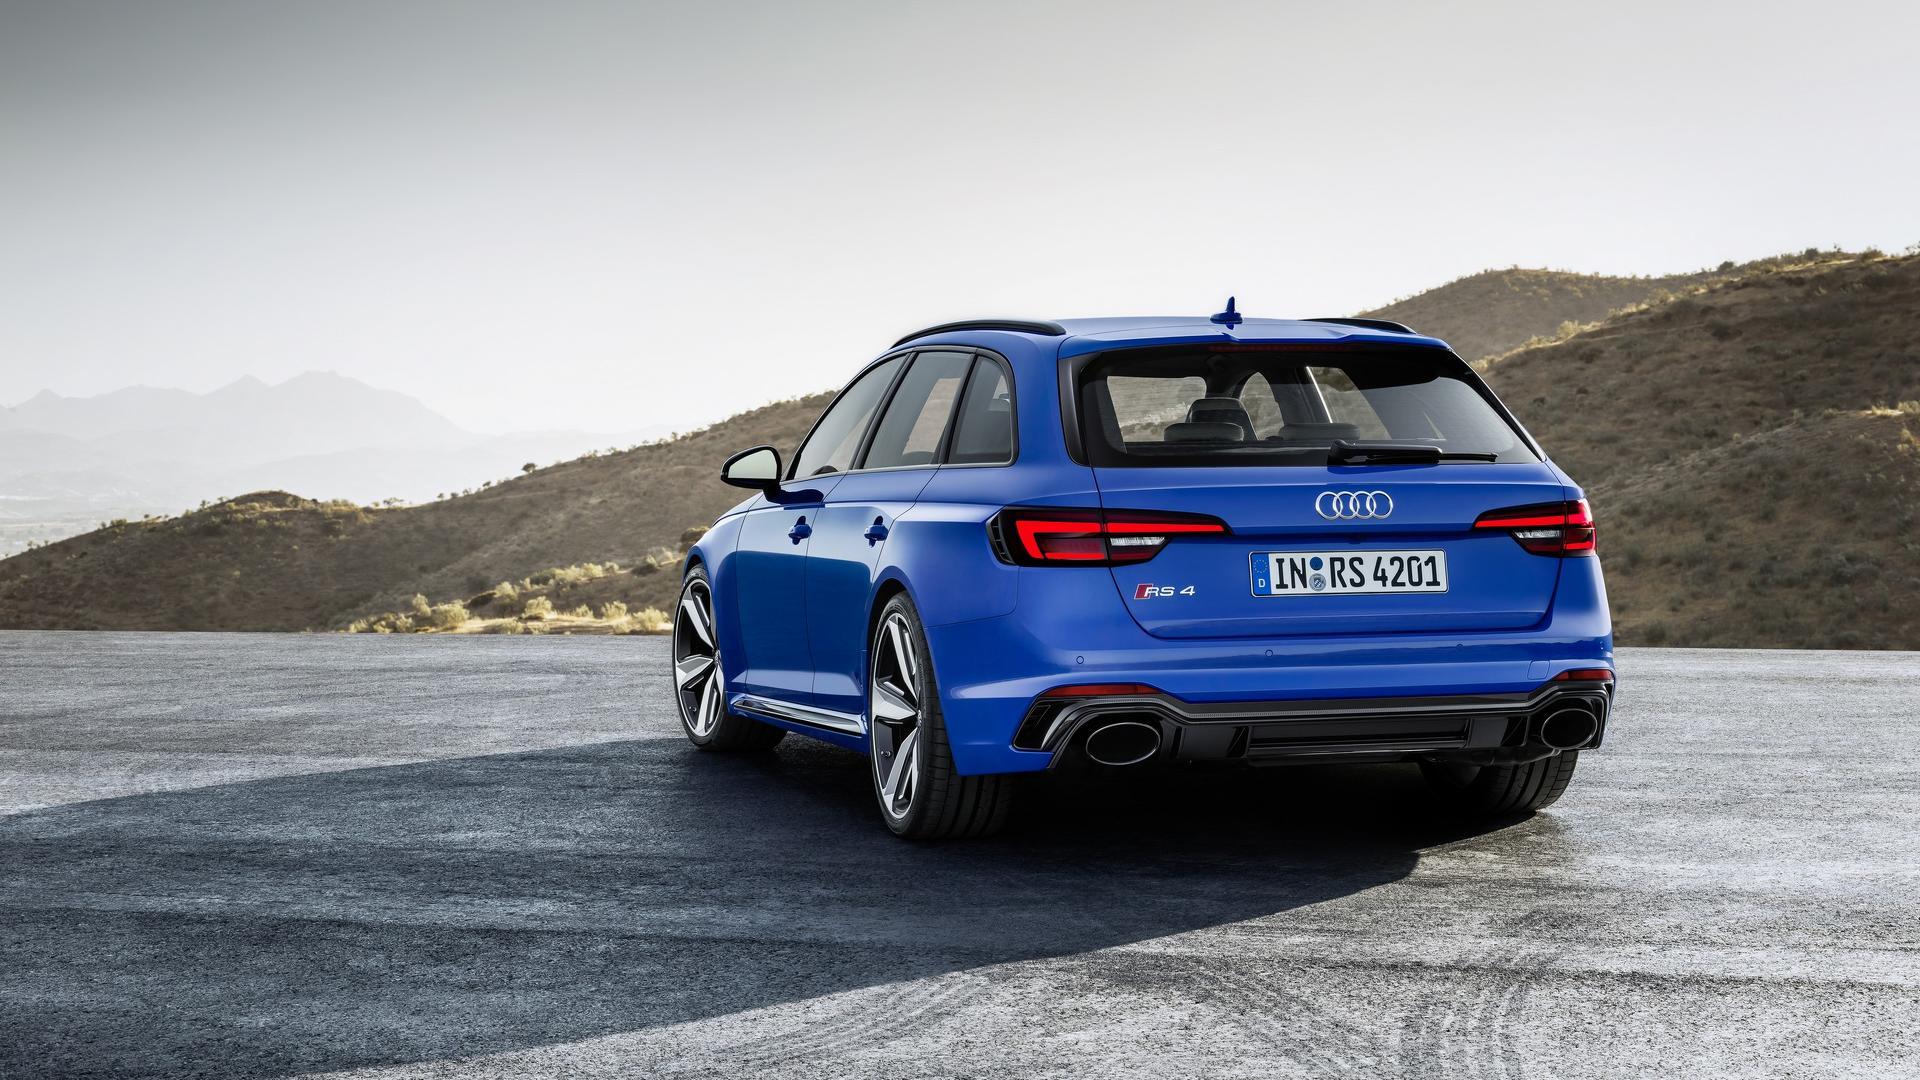 Kekurangan Audi Rs4 Avant 2018 Murah Berkualitas